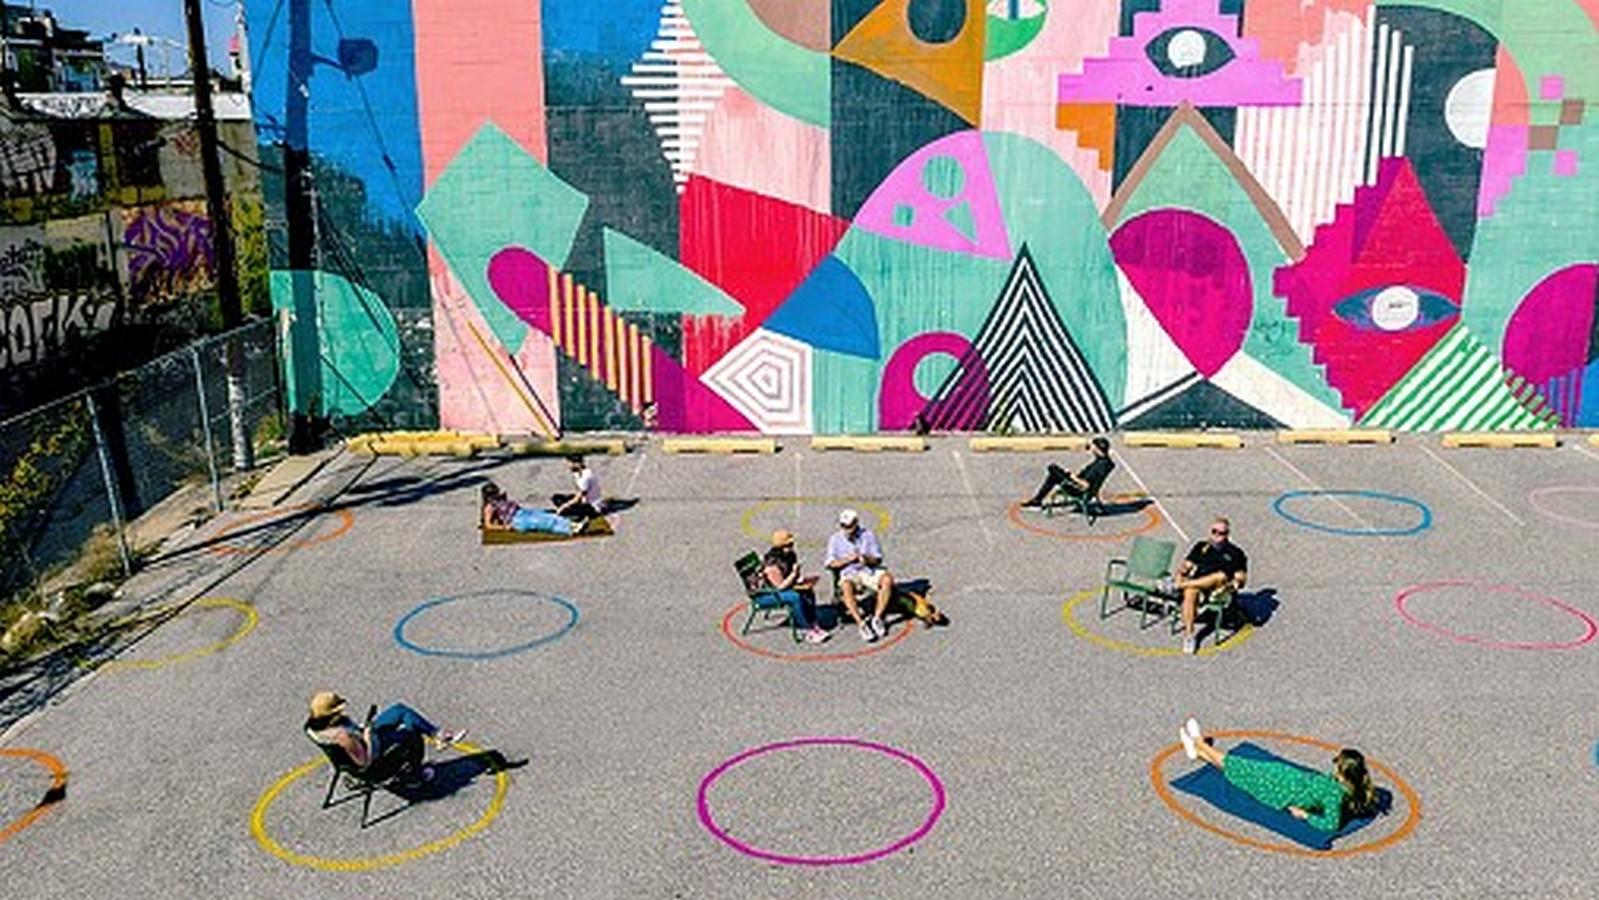 Gensler- 10 Cities & Urban Design Projects Sheet15